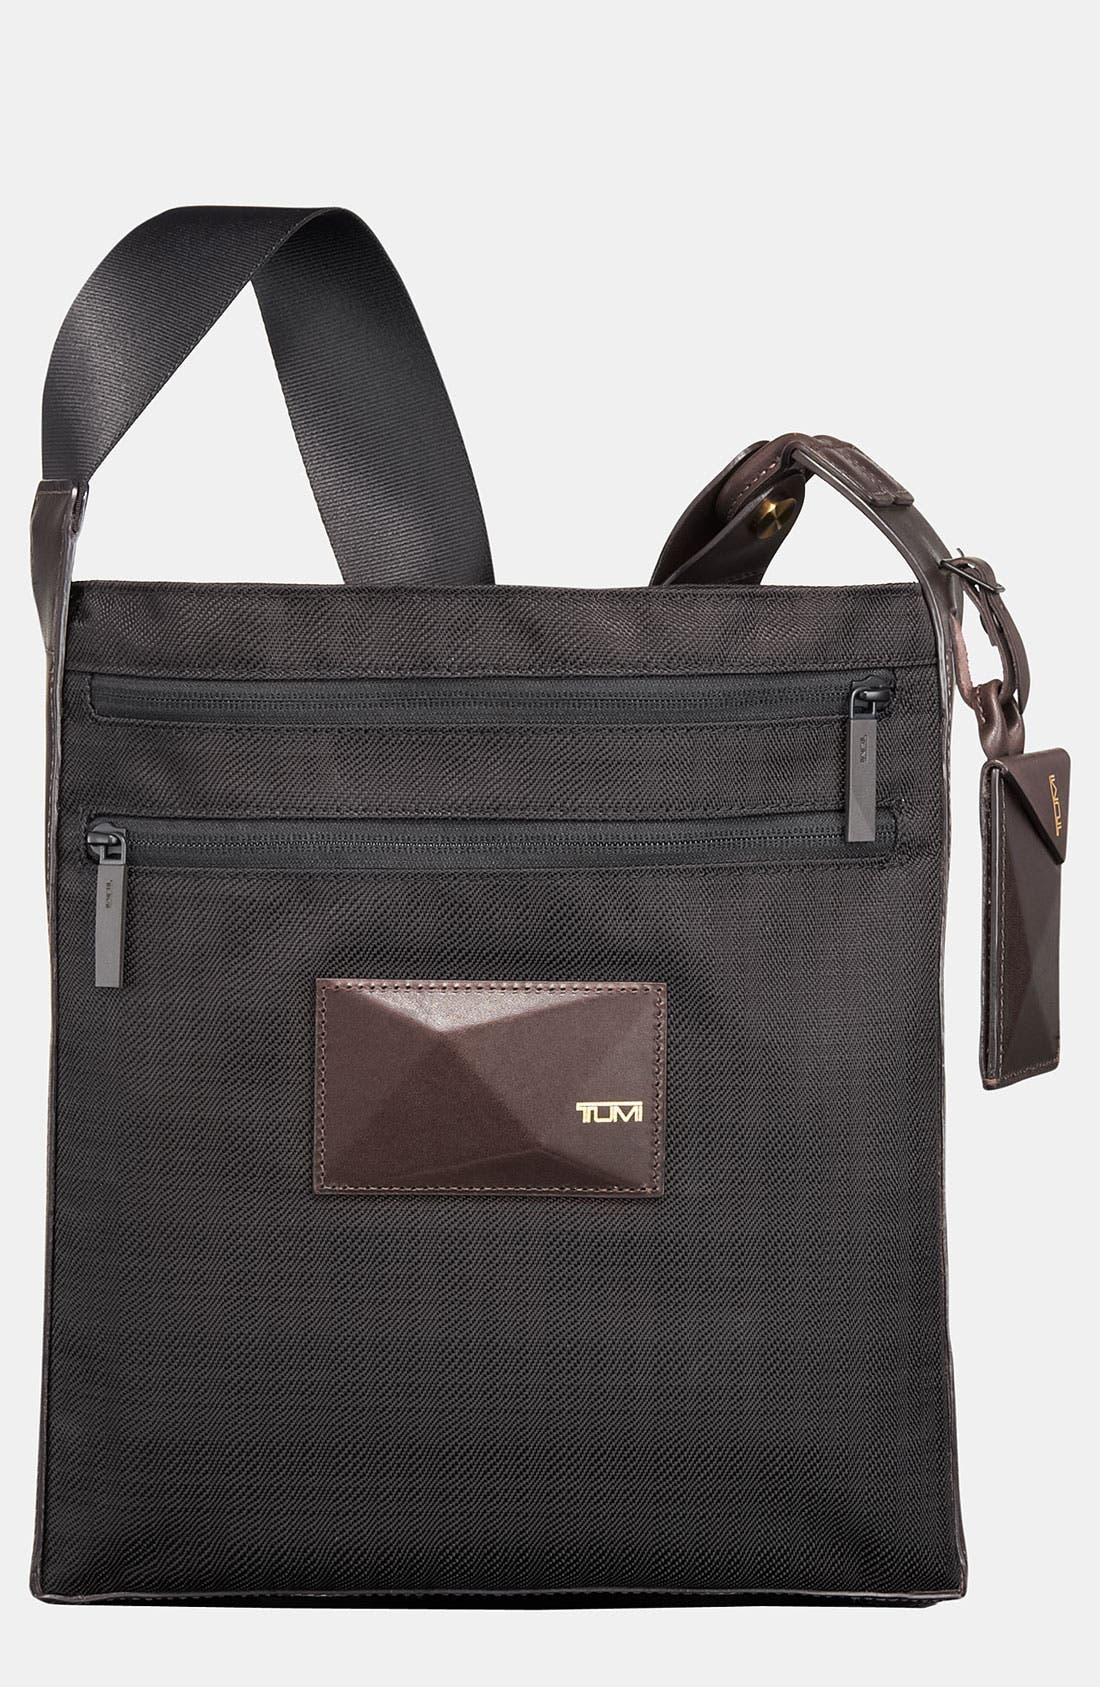 'Dror' Slim Crossbody Bag,                         Main,                         color, 207